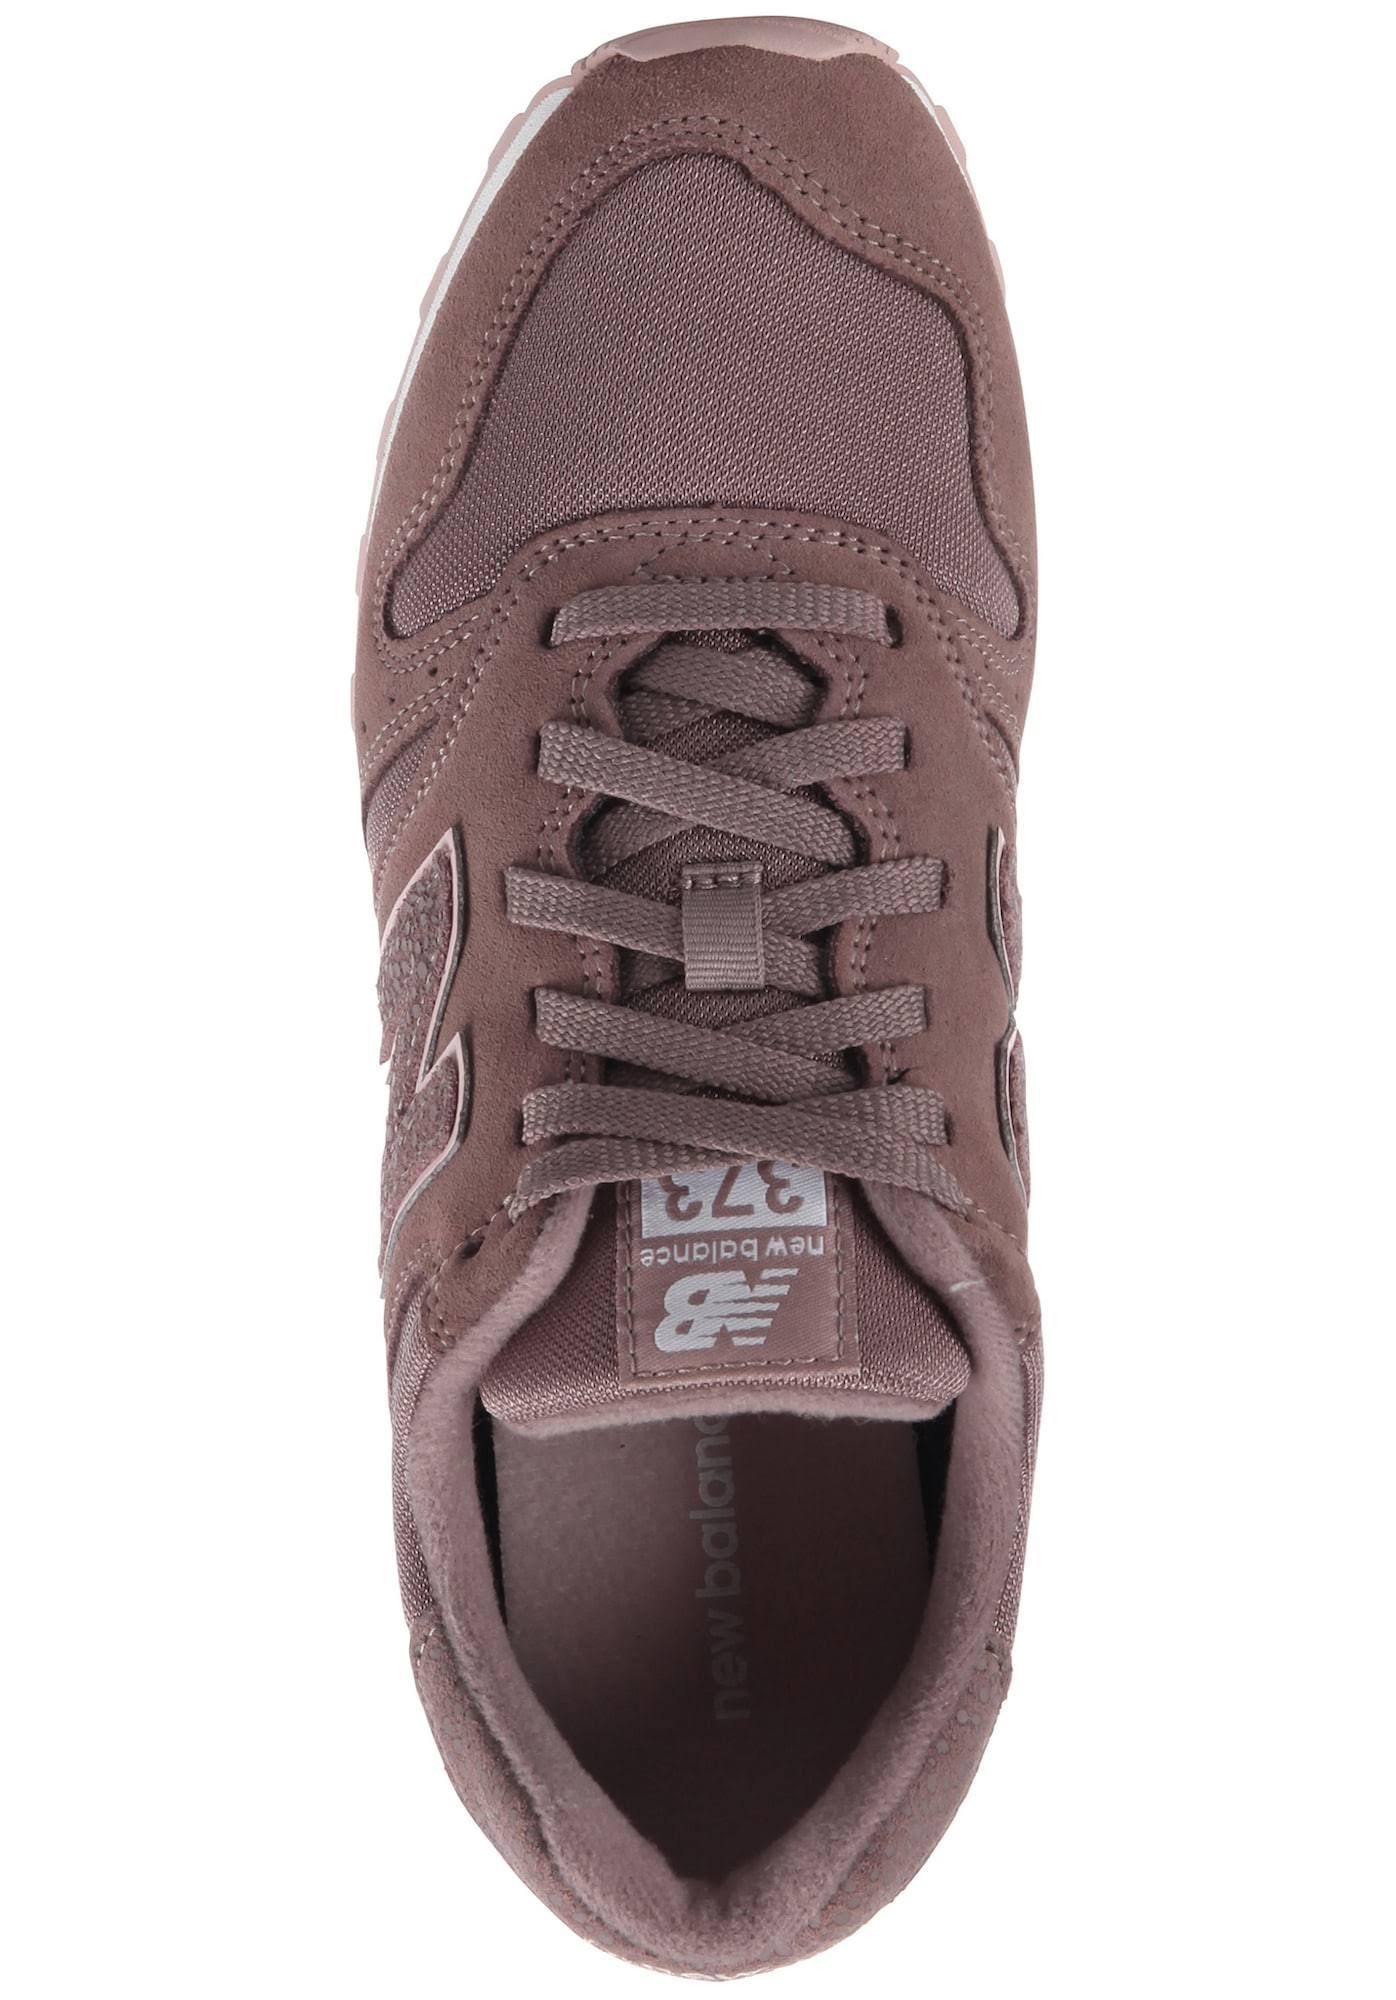 SneakersdonnaRosa Balance Wl373 Low New Antico mN0wvn8